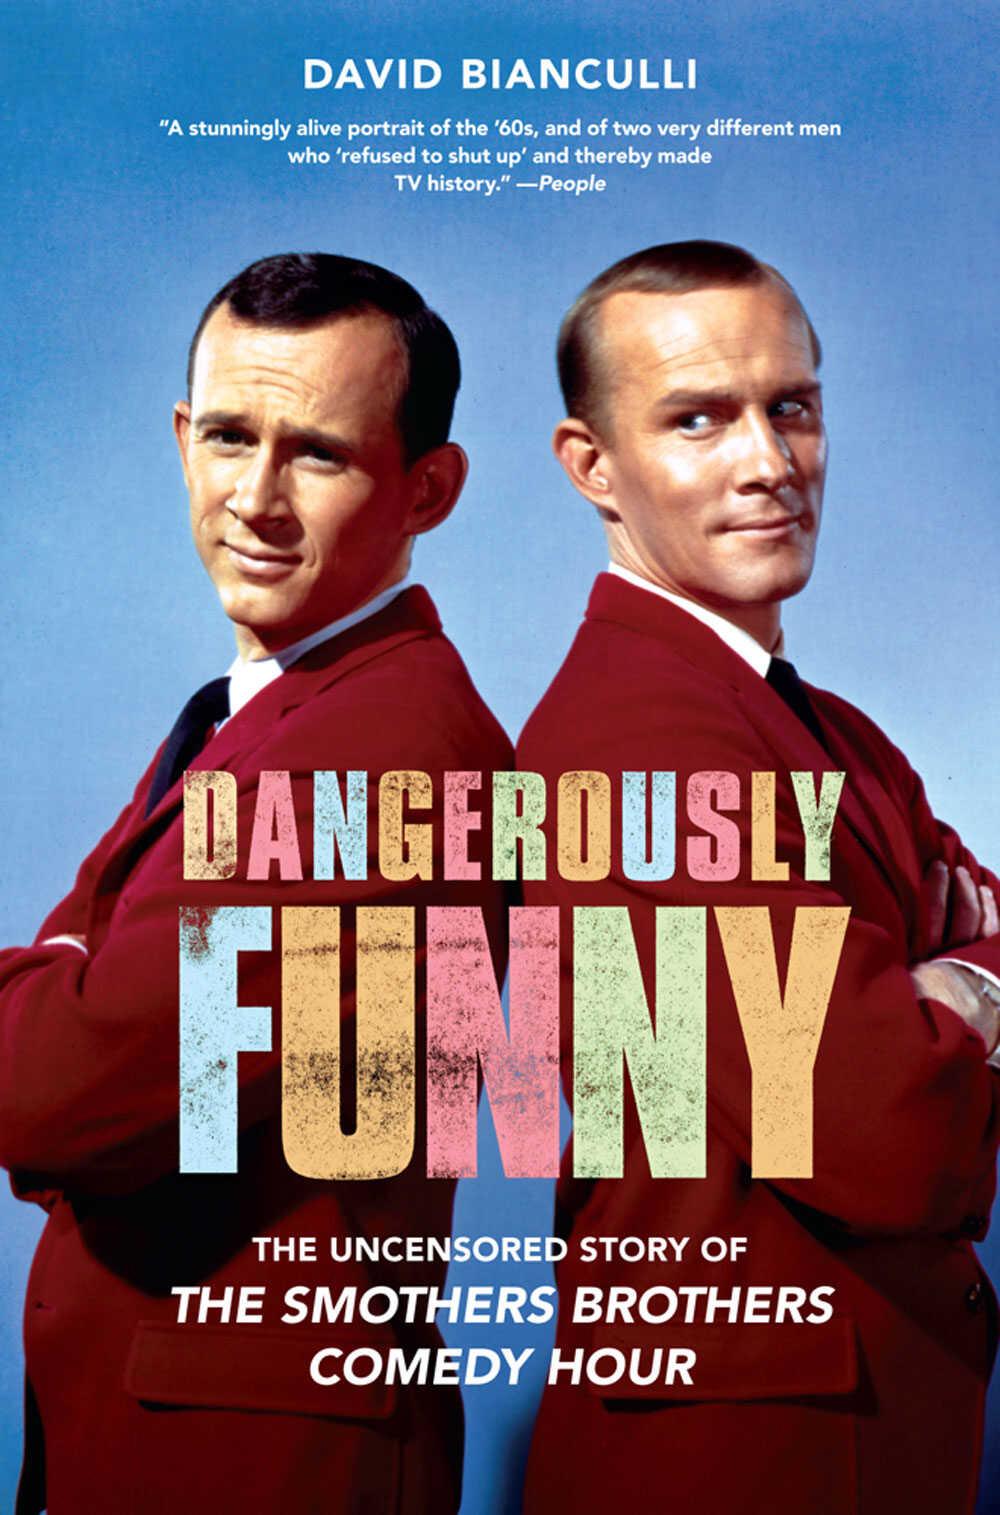 Dangerously Funny by David Bianculli